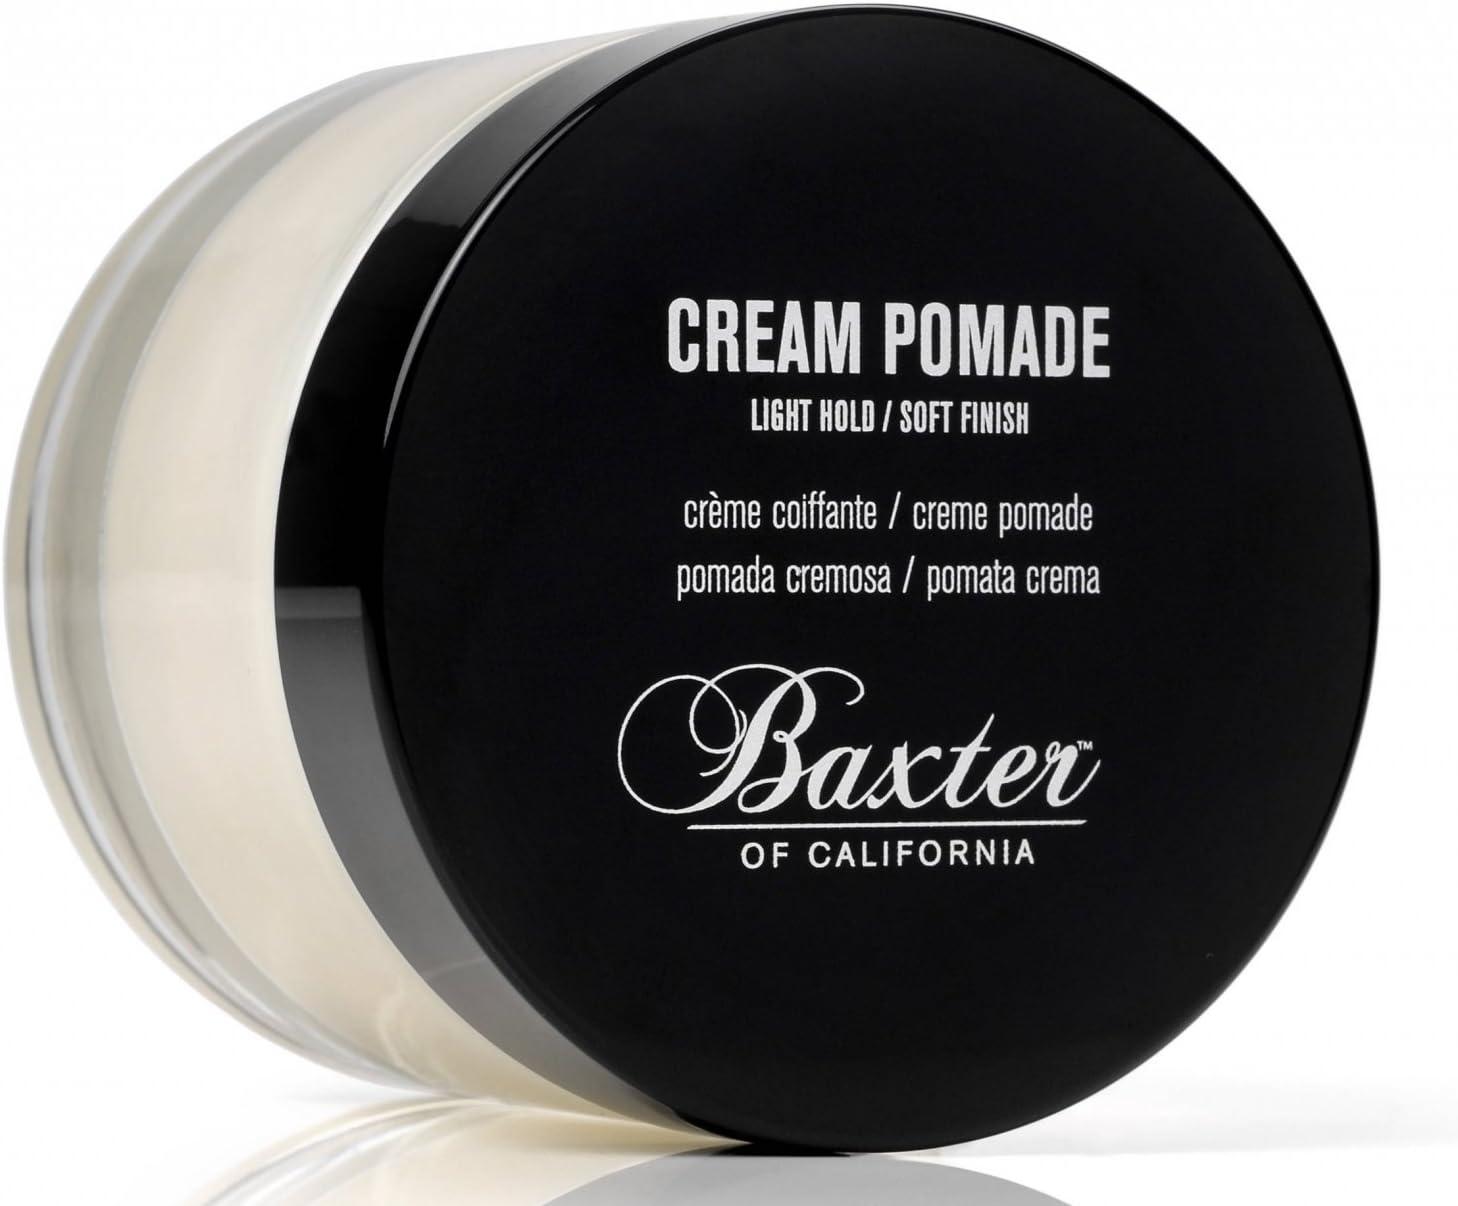 Baxter of California: Cream pomade